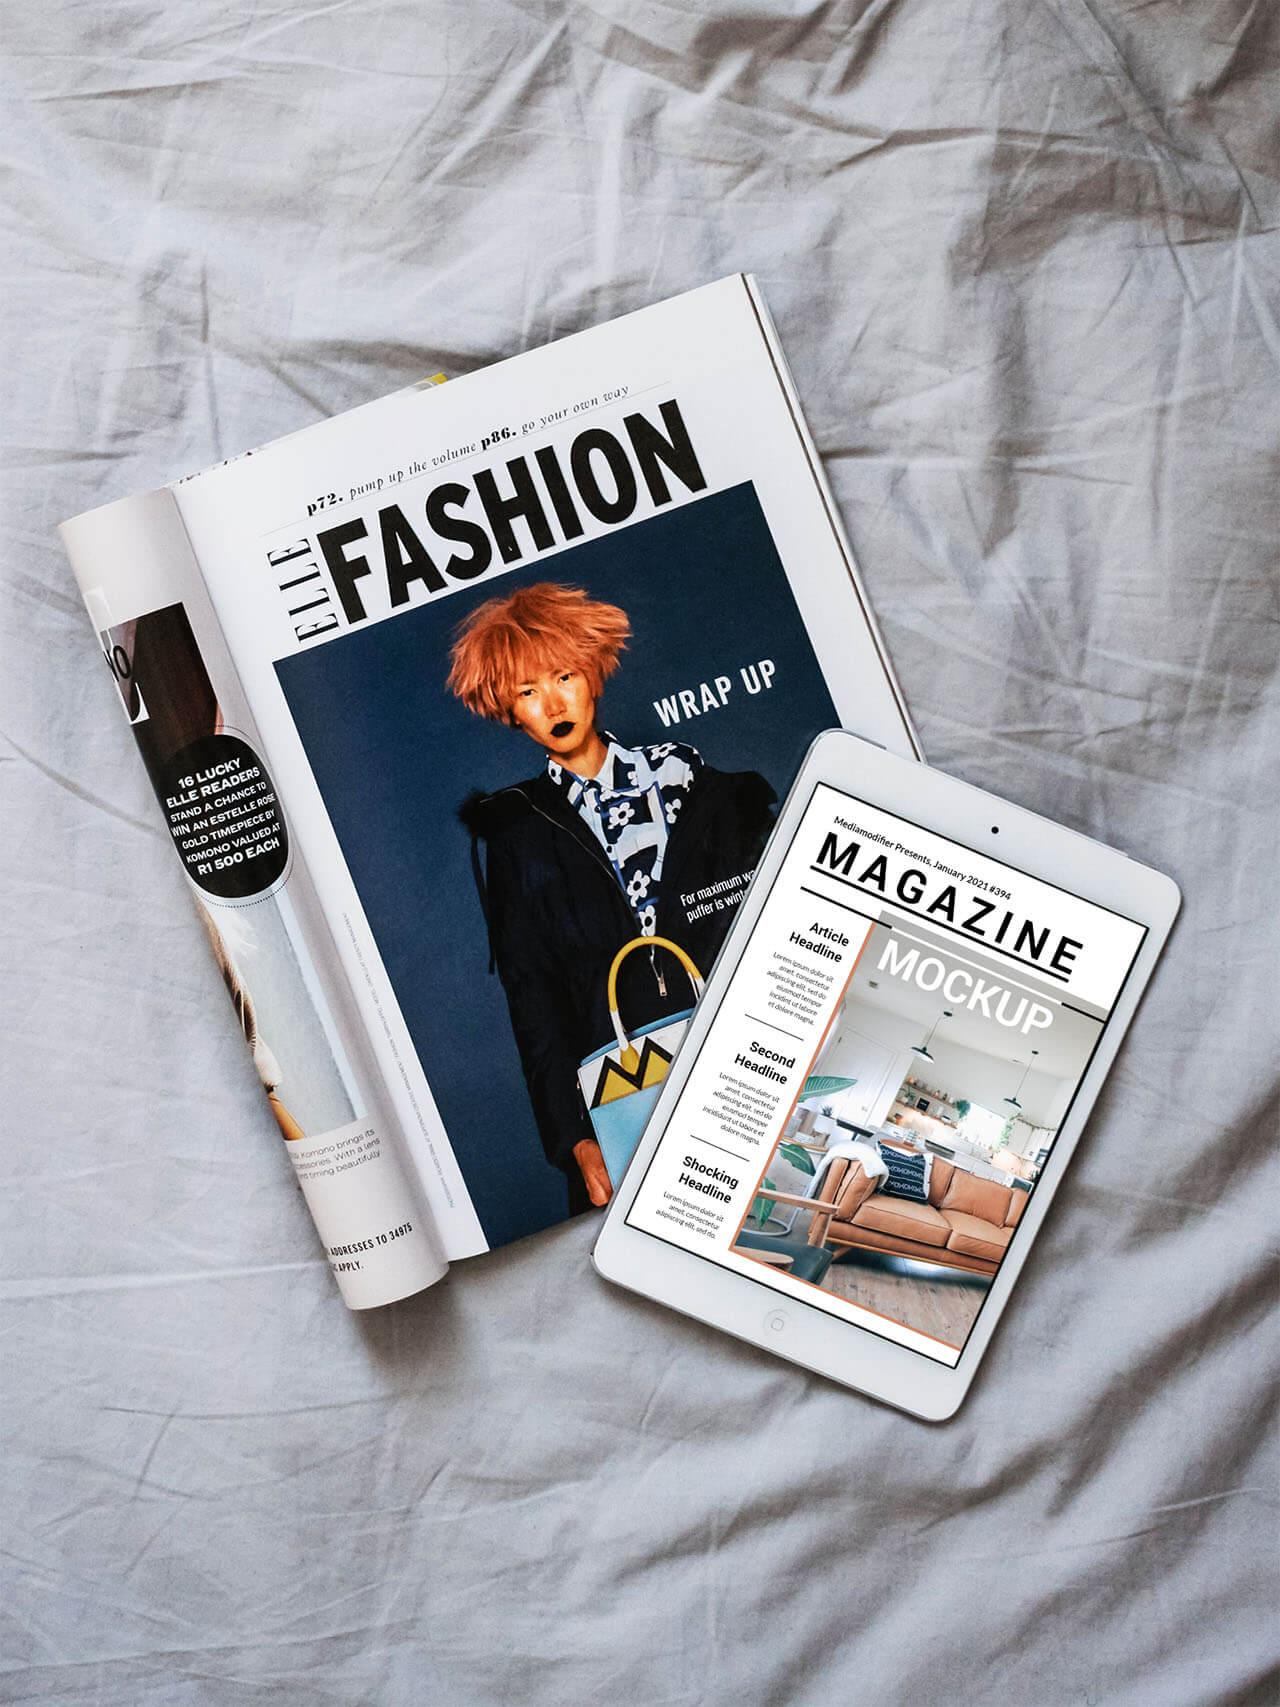 30-ipad-online-magazine-cover-mockup